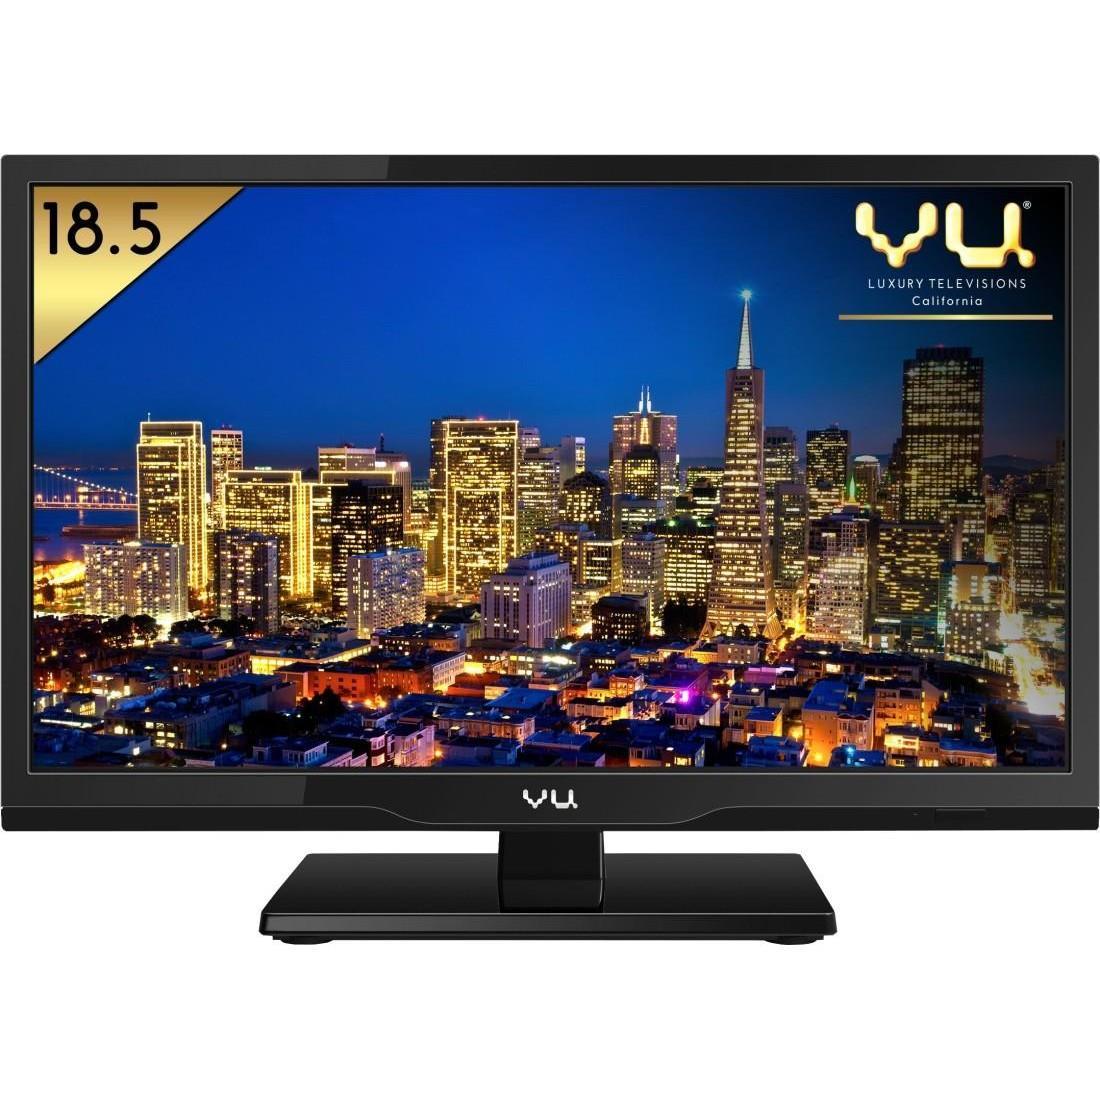 Vu 18.5 VL 47 cm (18.5) LED TV (HD Ready) Image